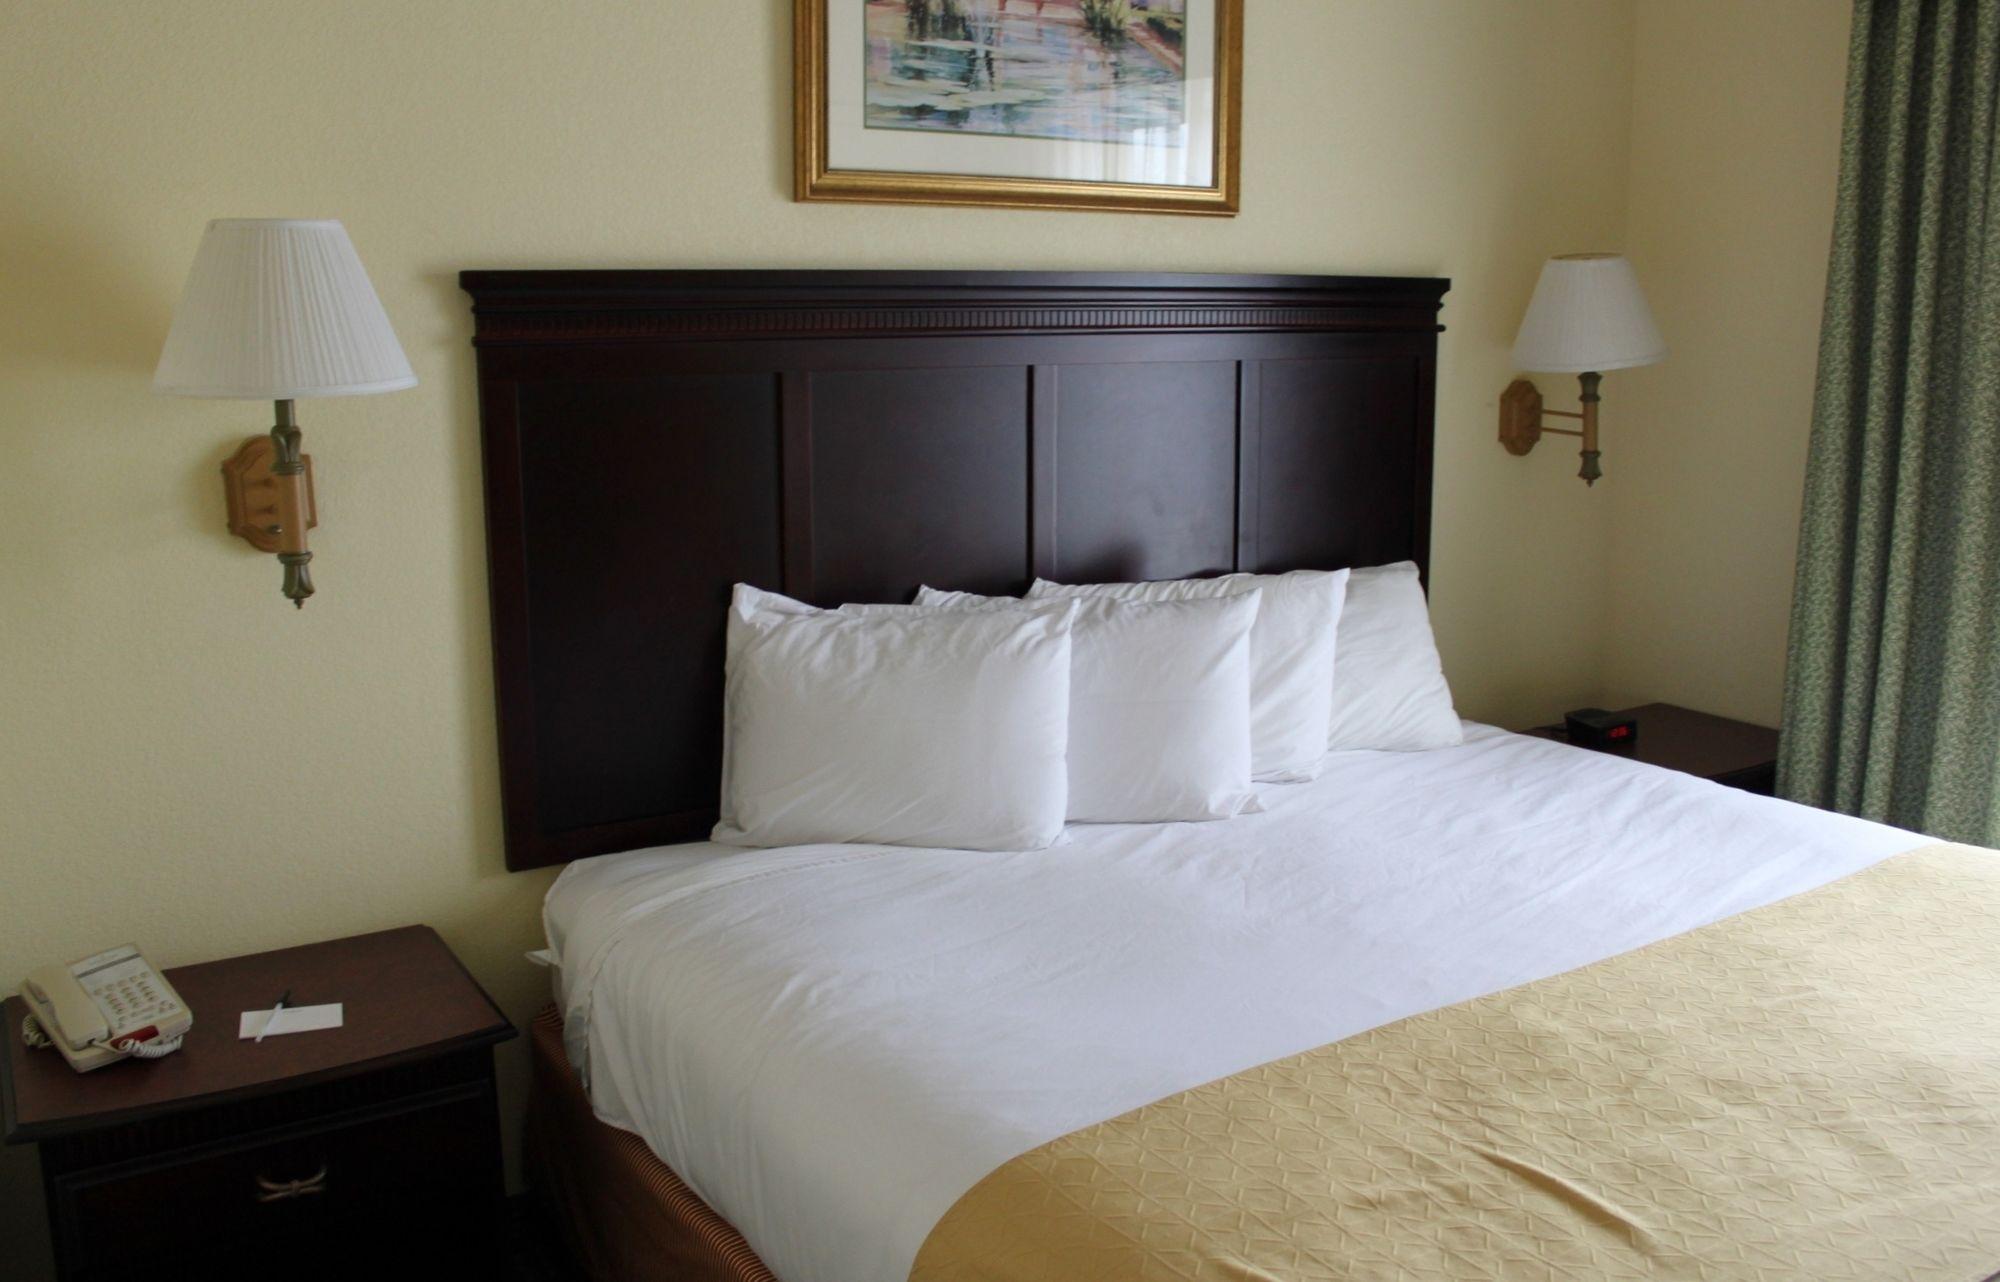 Country Inn & Suites in Calhoun, GA